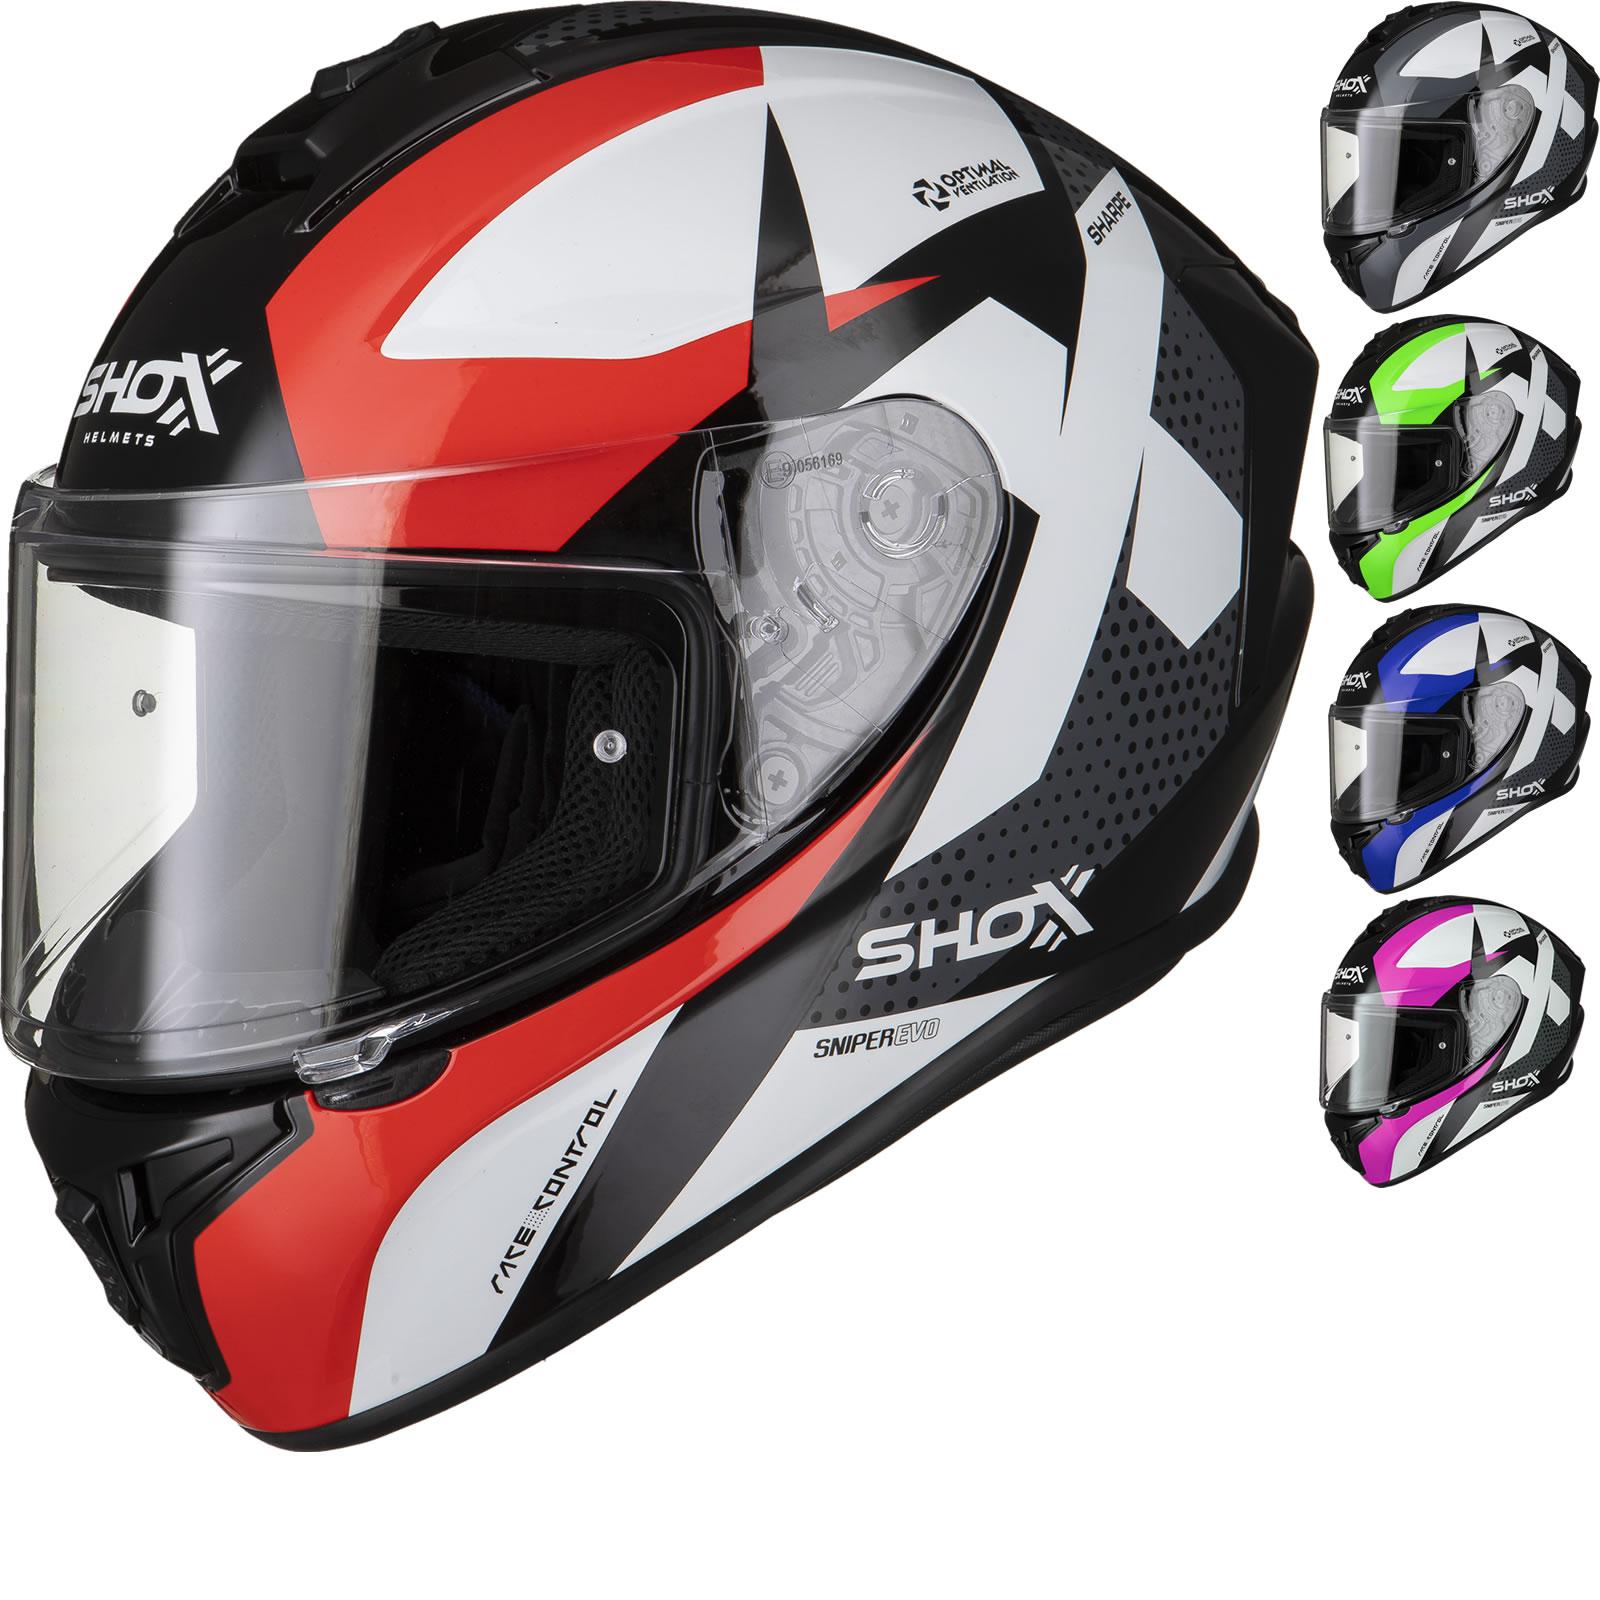 Shox Sniper Evo Sharpe Motorcycle Helmet - £30.09 @ Ghost Bikes